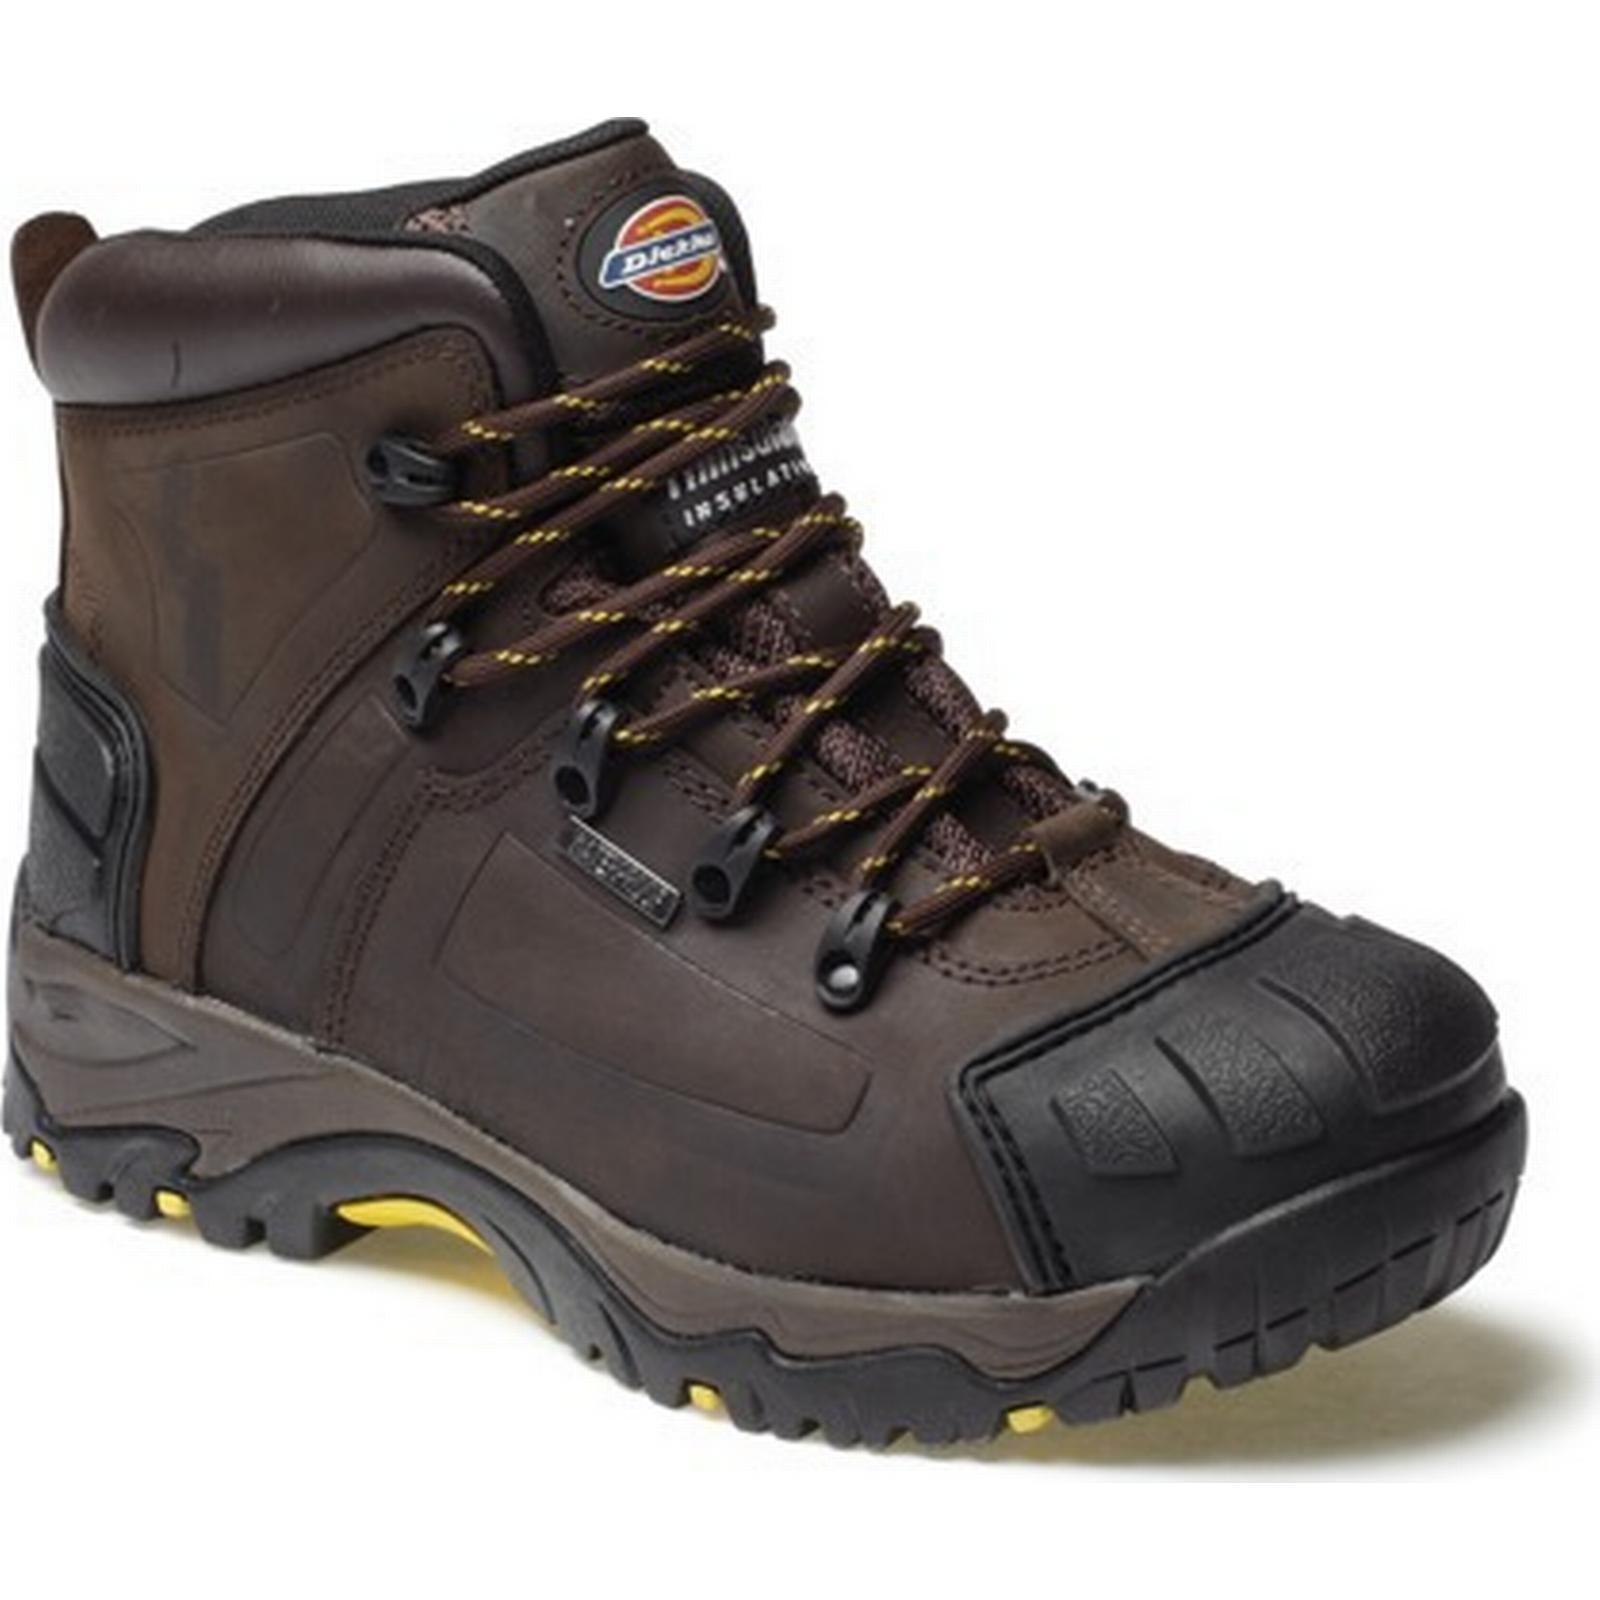 Dickies Workwear Dickies Dickies Workwear Medway Super Safety Hiker Brown / 11.5 532d0e